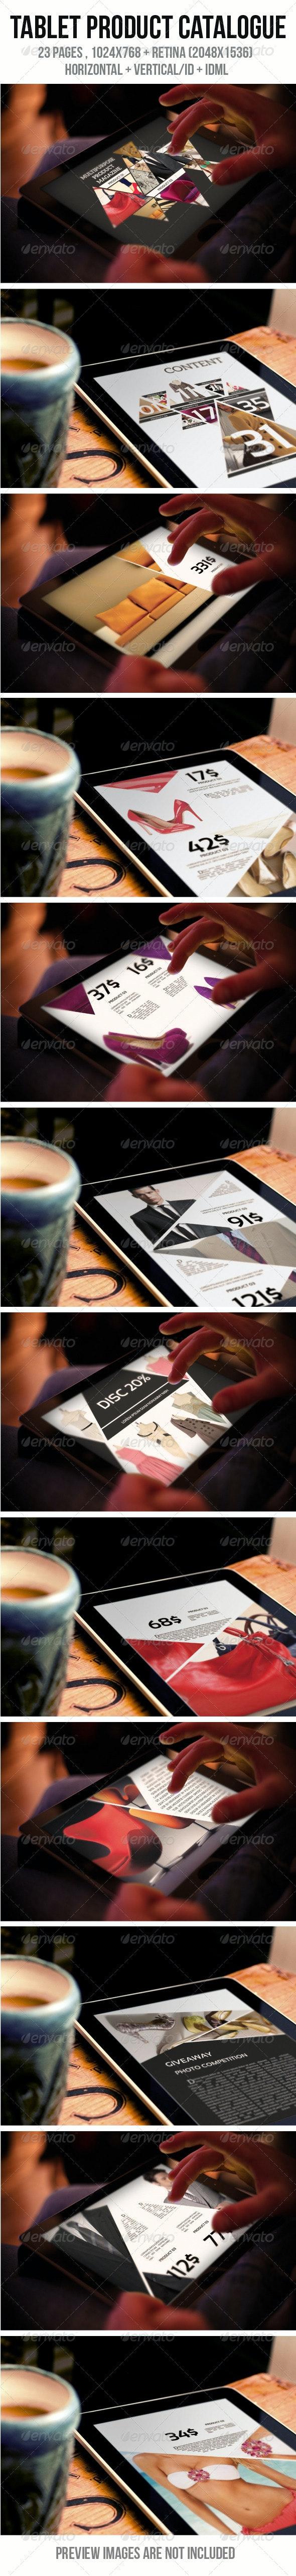 iPad & Tablet Product Catalogue